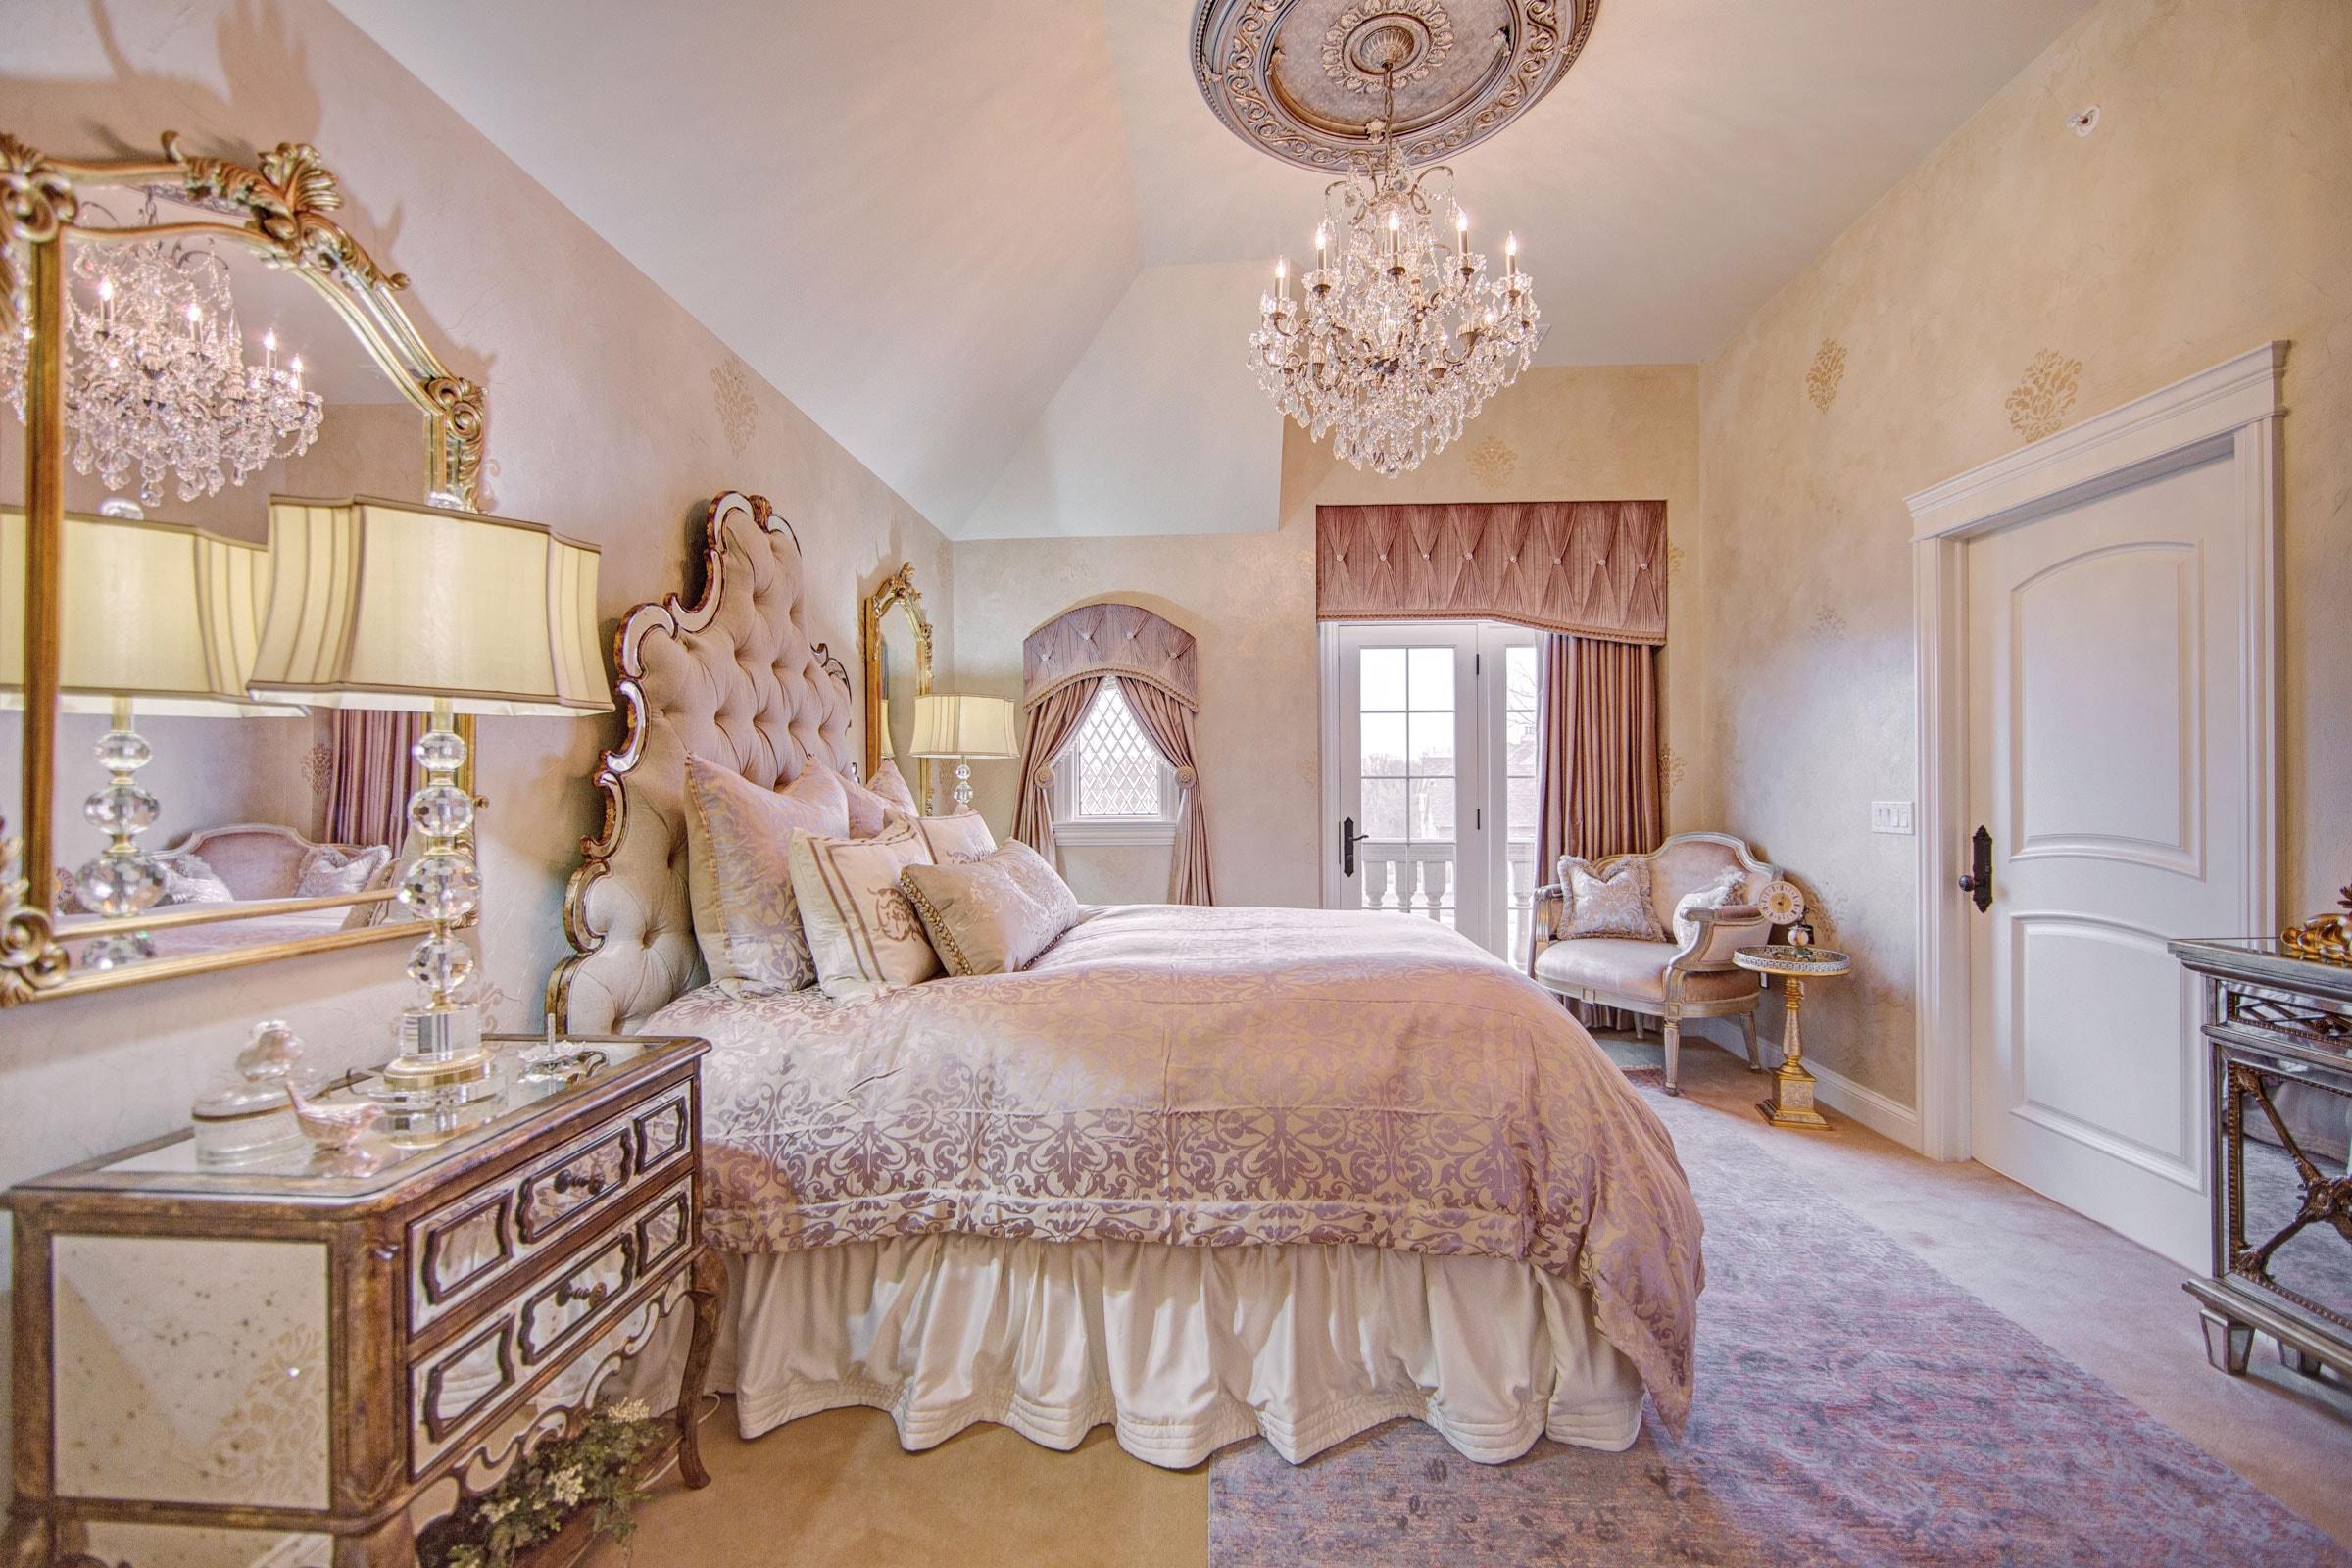 Luxury-Girls-Bedroom-Interior-Design on Beautiful Room For Girls  id=71883